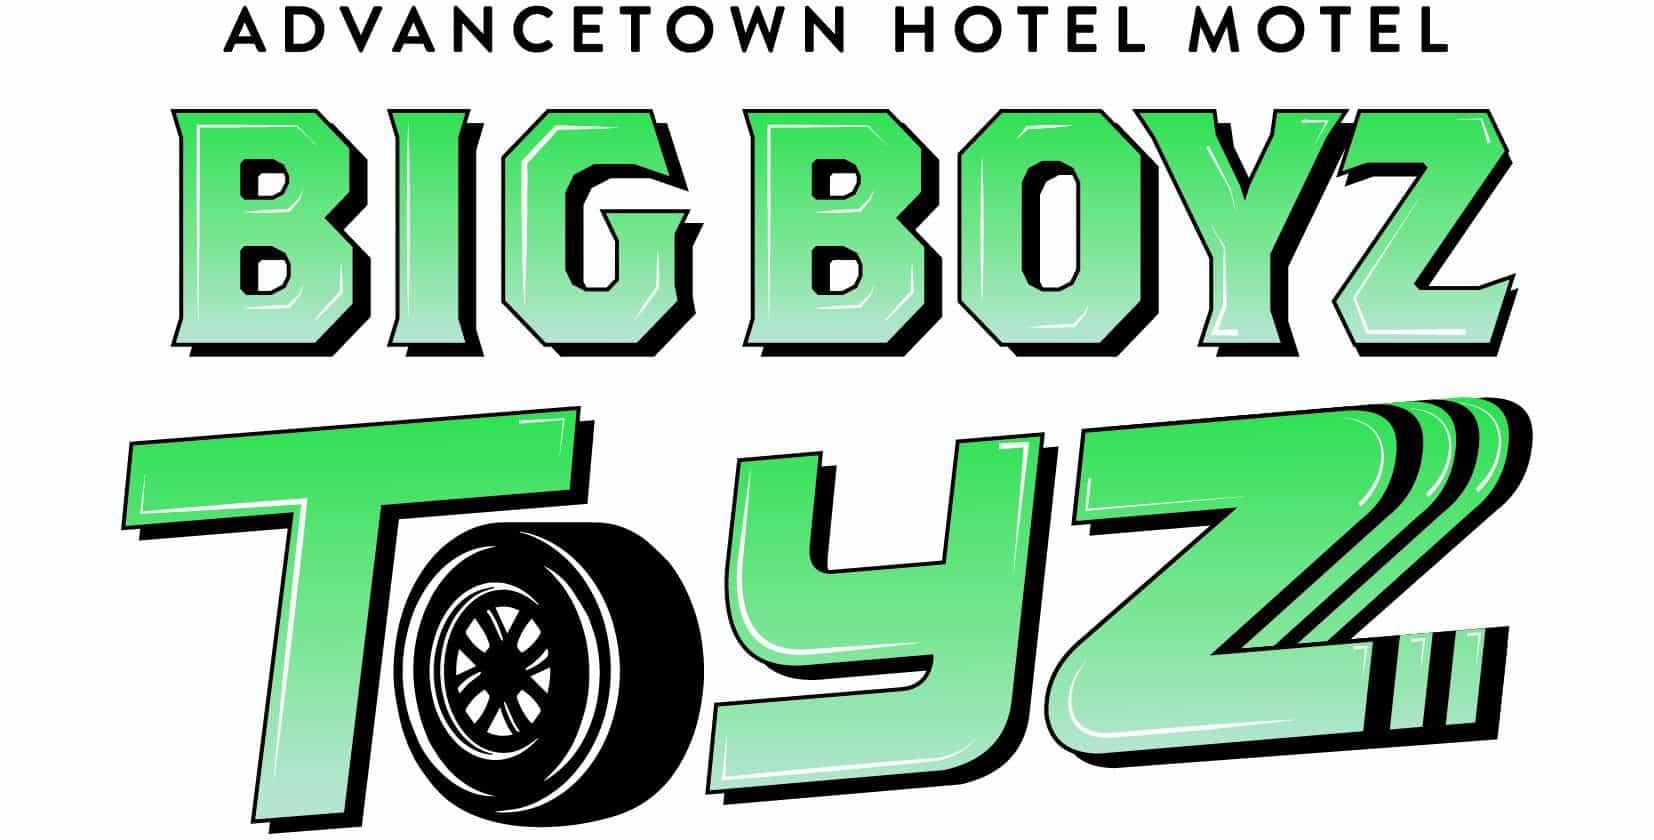 Big Boyz Toyzzz Custom Car & Bike Show at The Advancetown Hotel